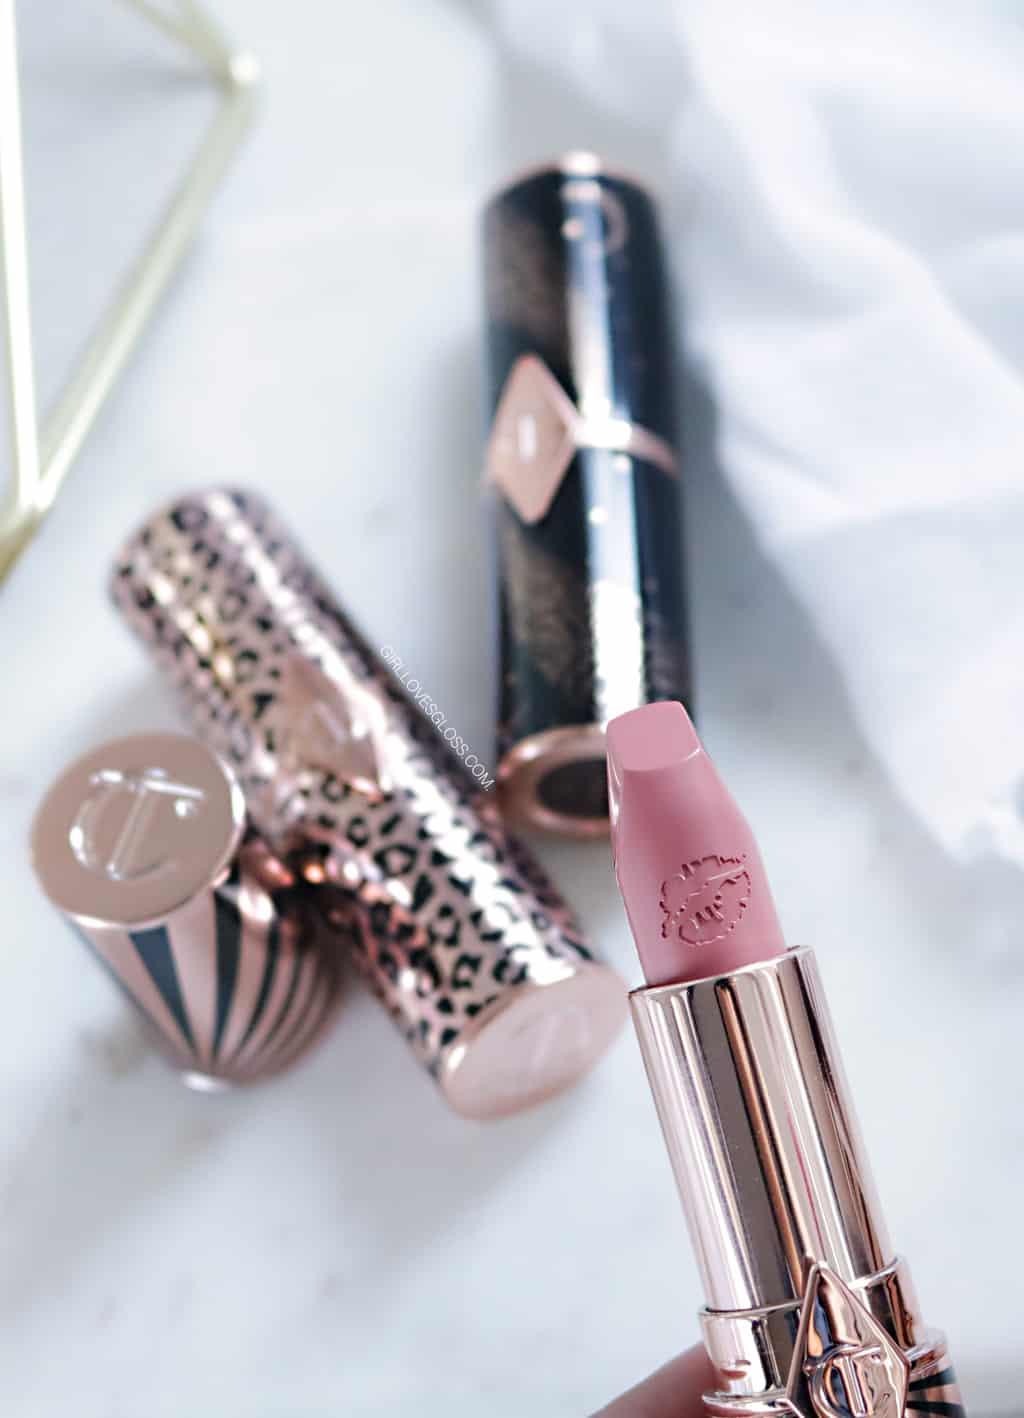 Charlotte Tilbury Hot Lips 2 Lipsticks